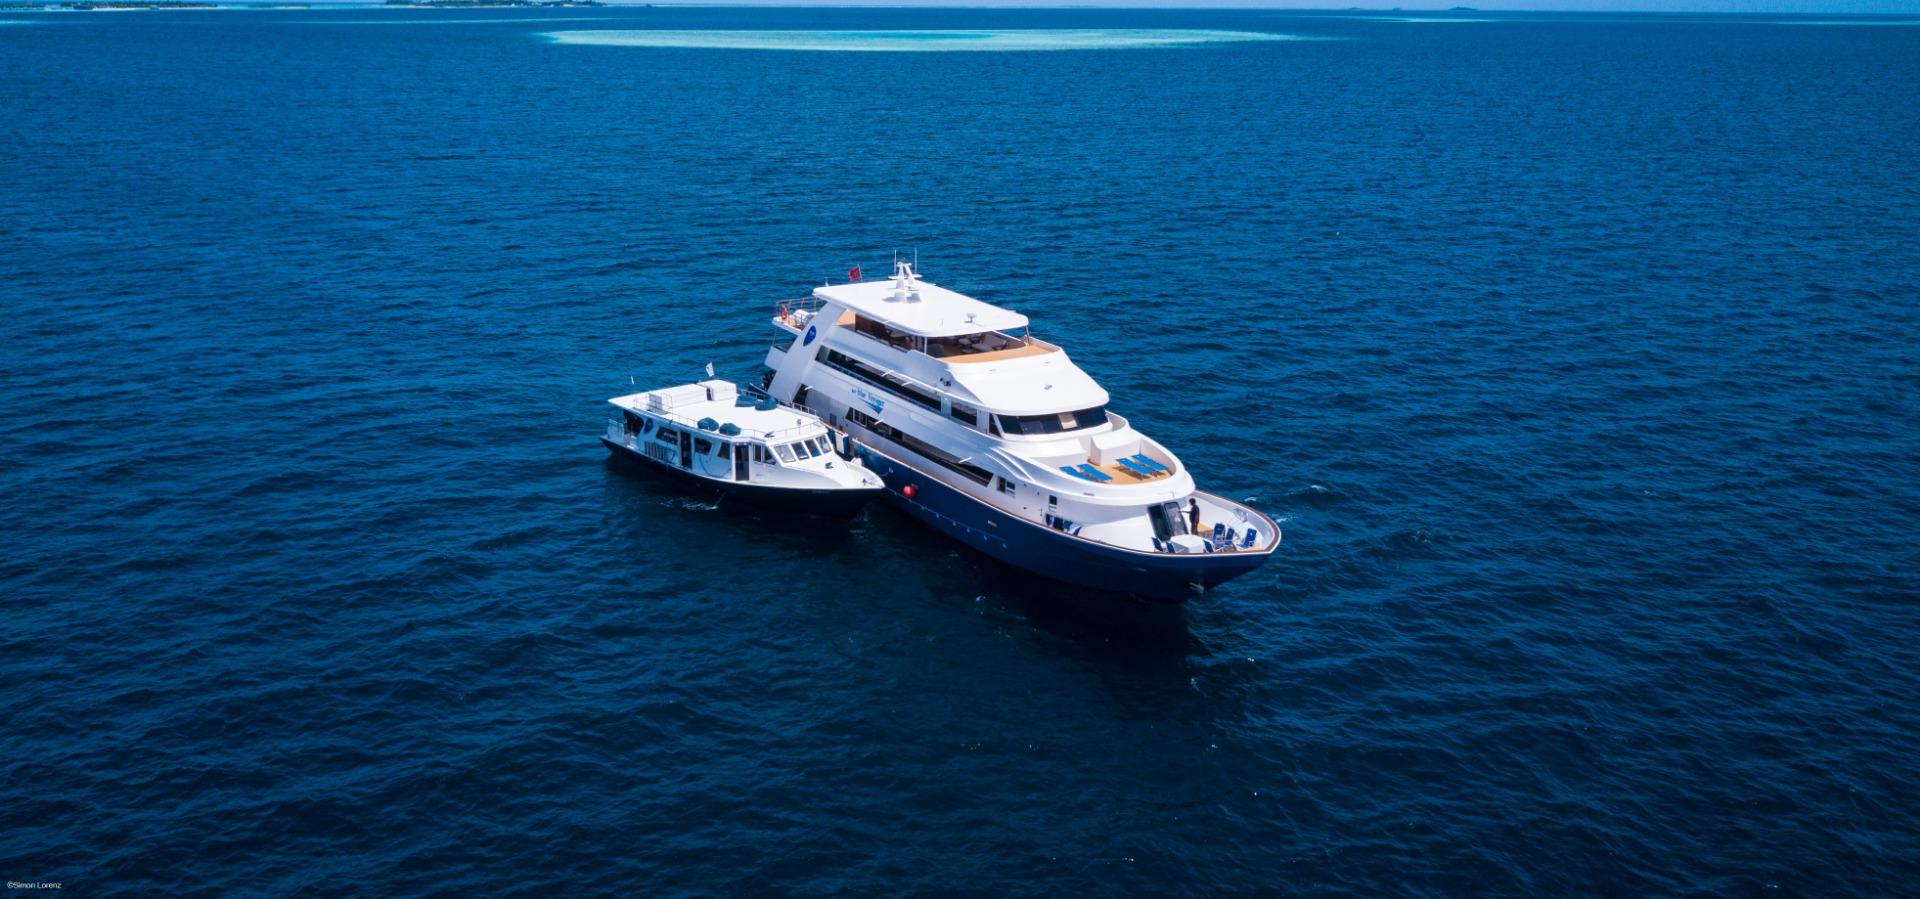 Blue voyager and Dhoni, maldives. Credit to Simon Lorenz